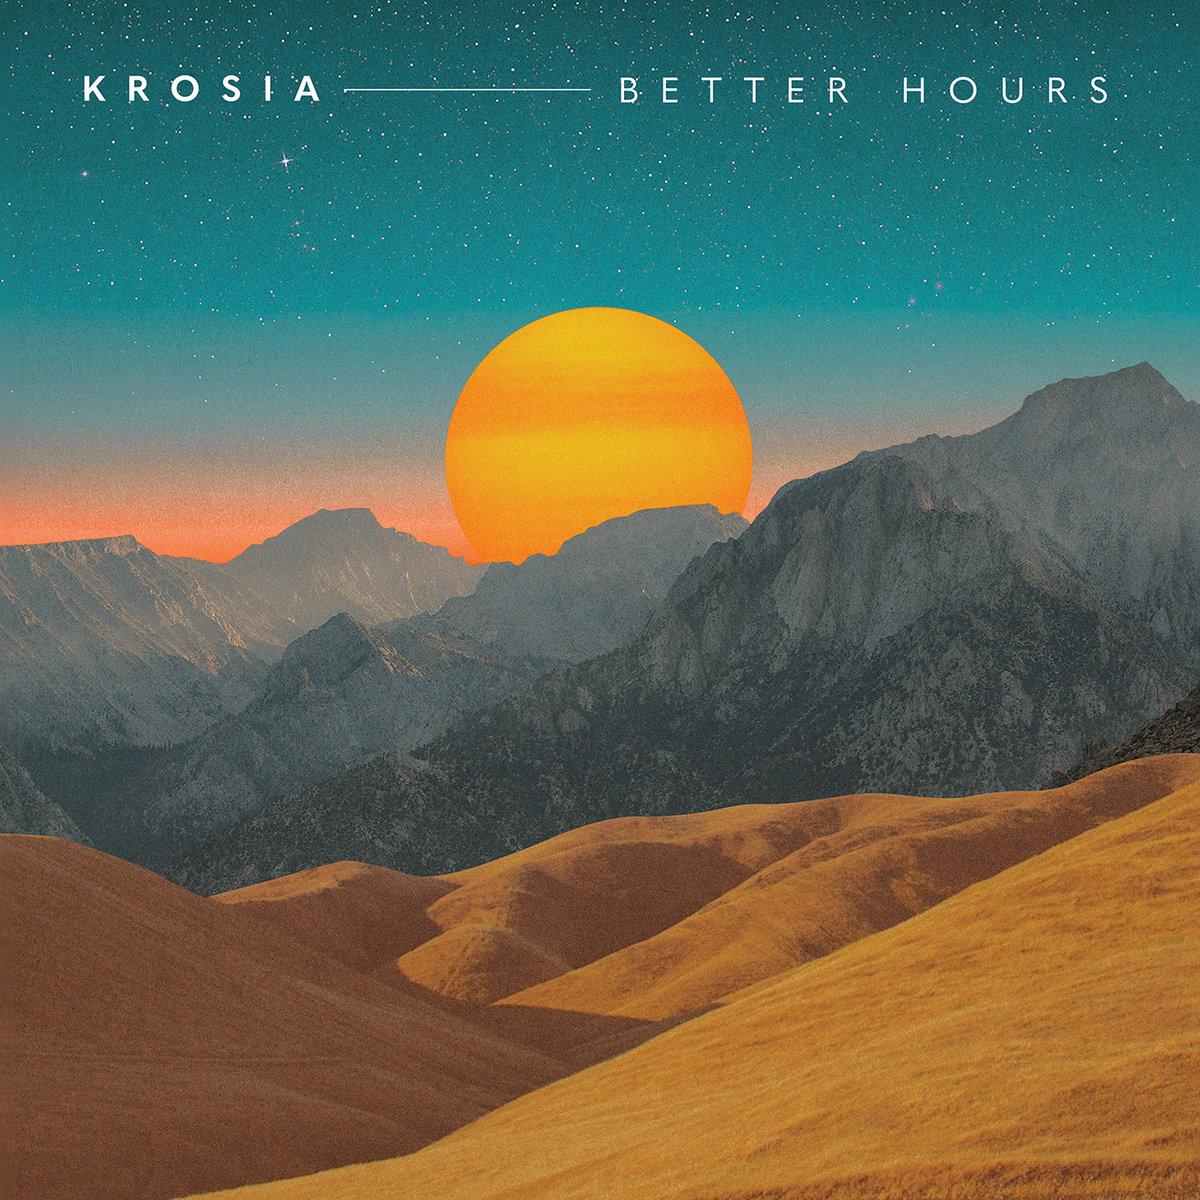 Krosia - Better Hours